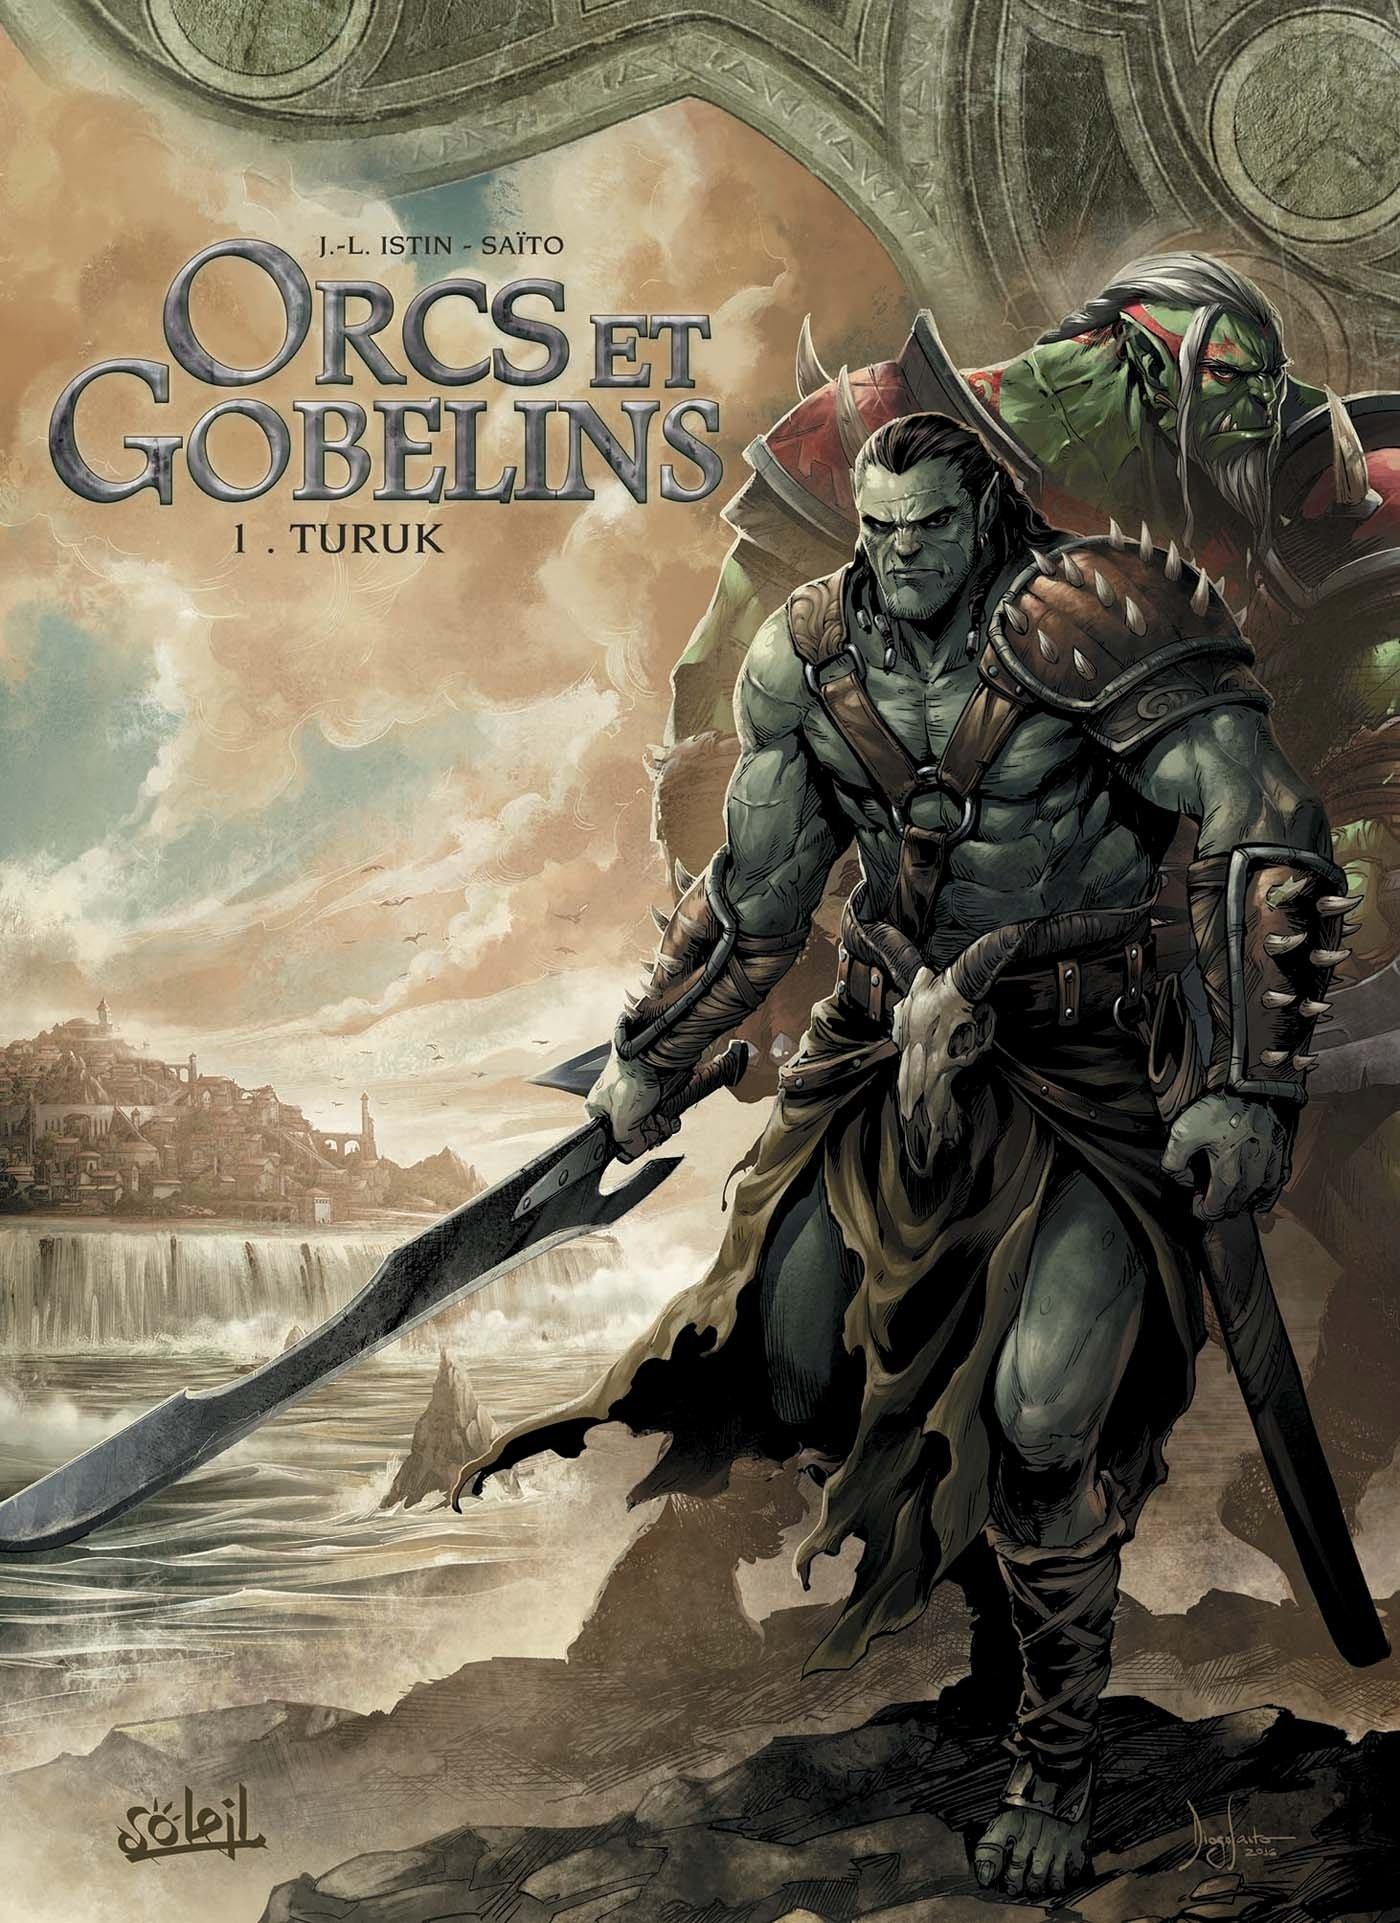 Orcs et Gobelins 1 - Turuk